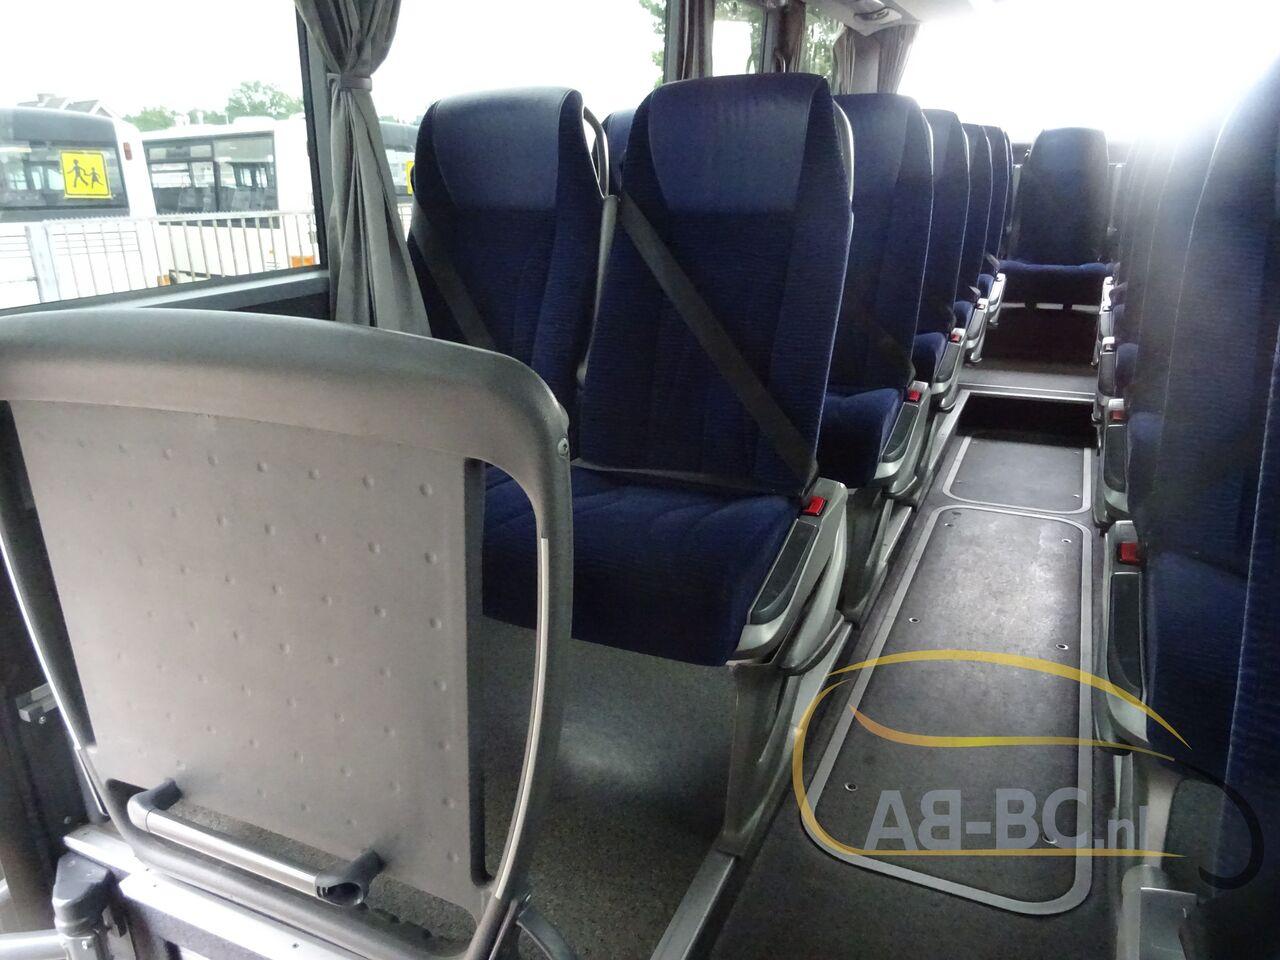 coach-busSETRA-S415-GT-HD-FINAL-EDITION---1627457237371922539_big_66e0efb34a306a091a94a0da4b7c4471--21050713010665719300